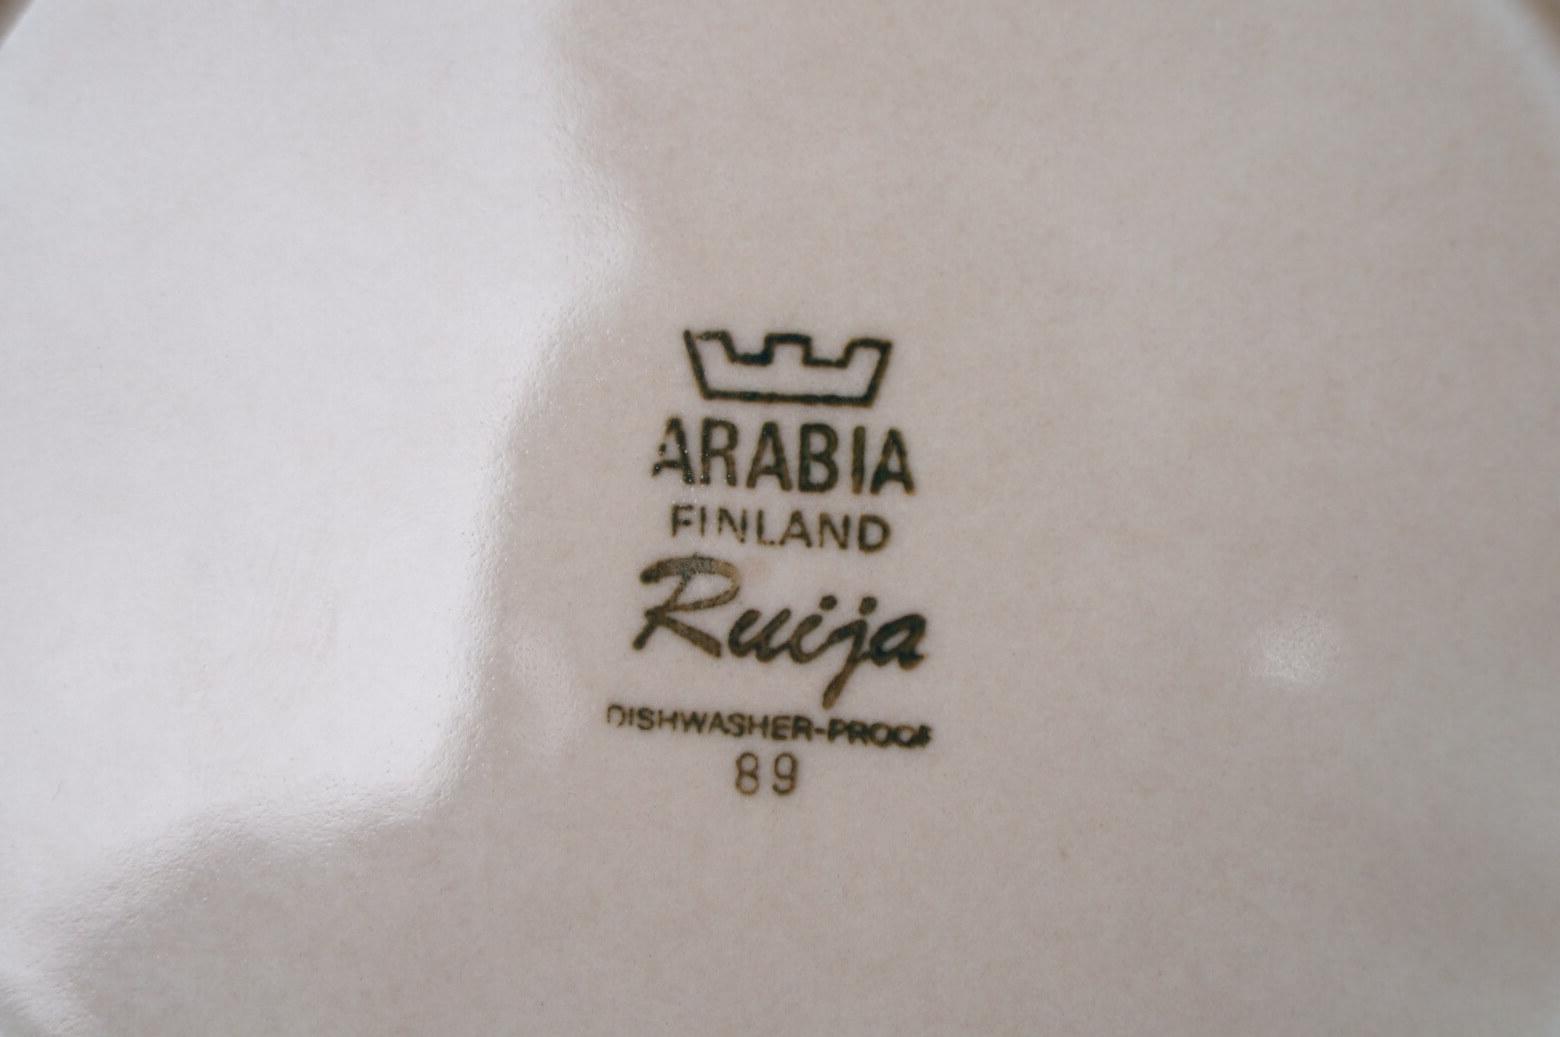 ARABIA FINLAND RUIJA 20cm PALTE / アラビア ルイヤ プレート 2